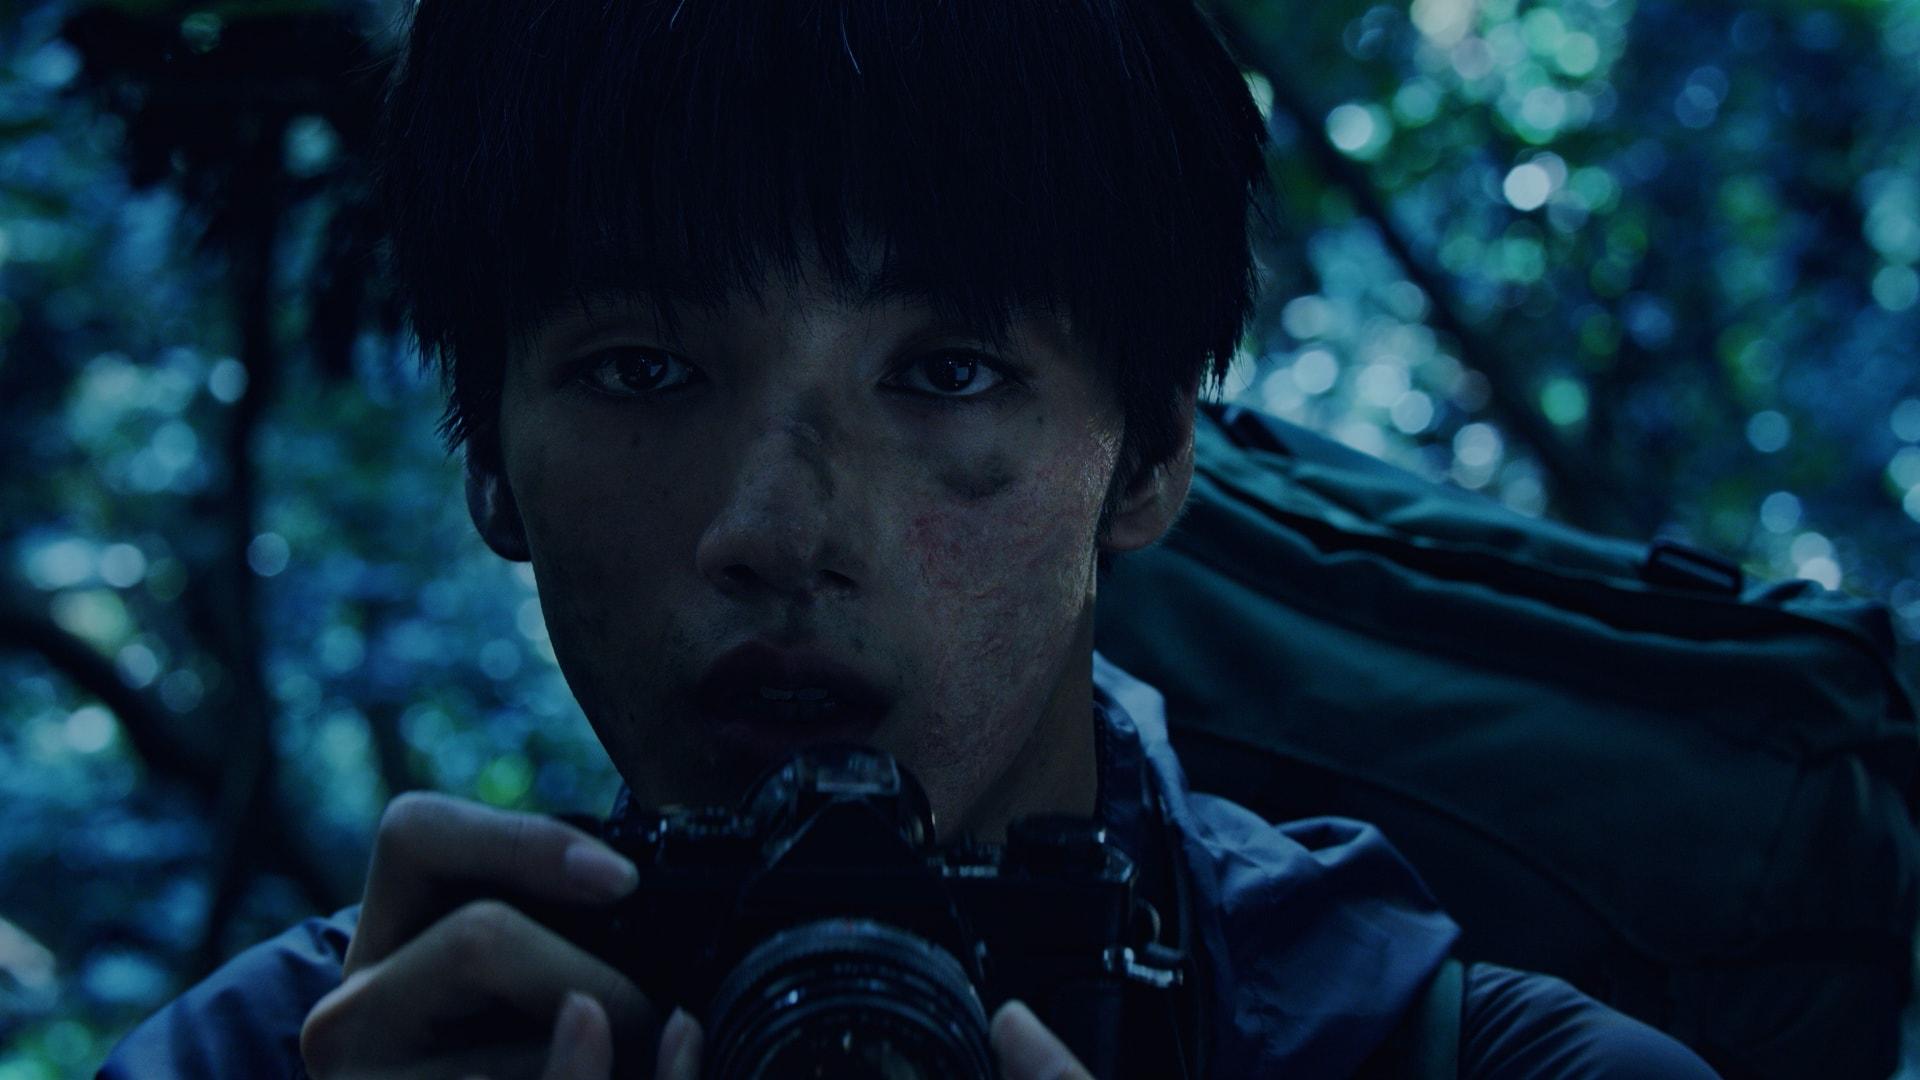 aoimori_long_final_thumbnail.01_01_51_09.Still009-min.jpg